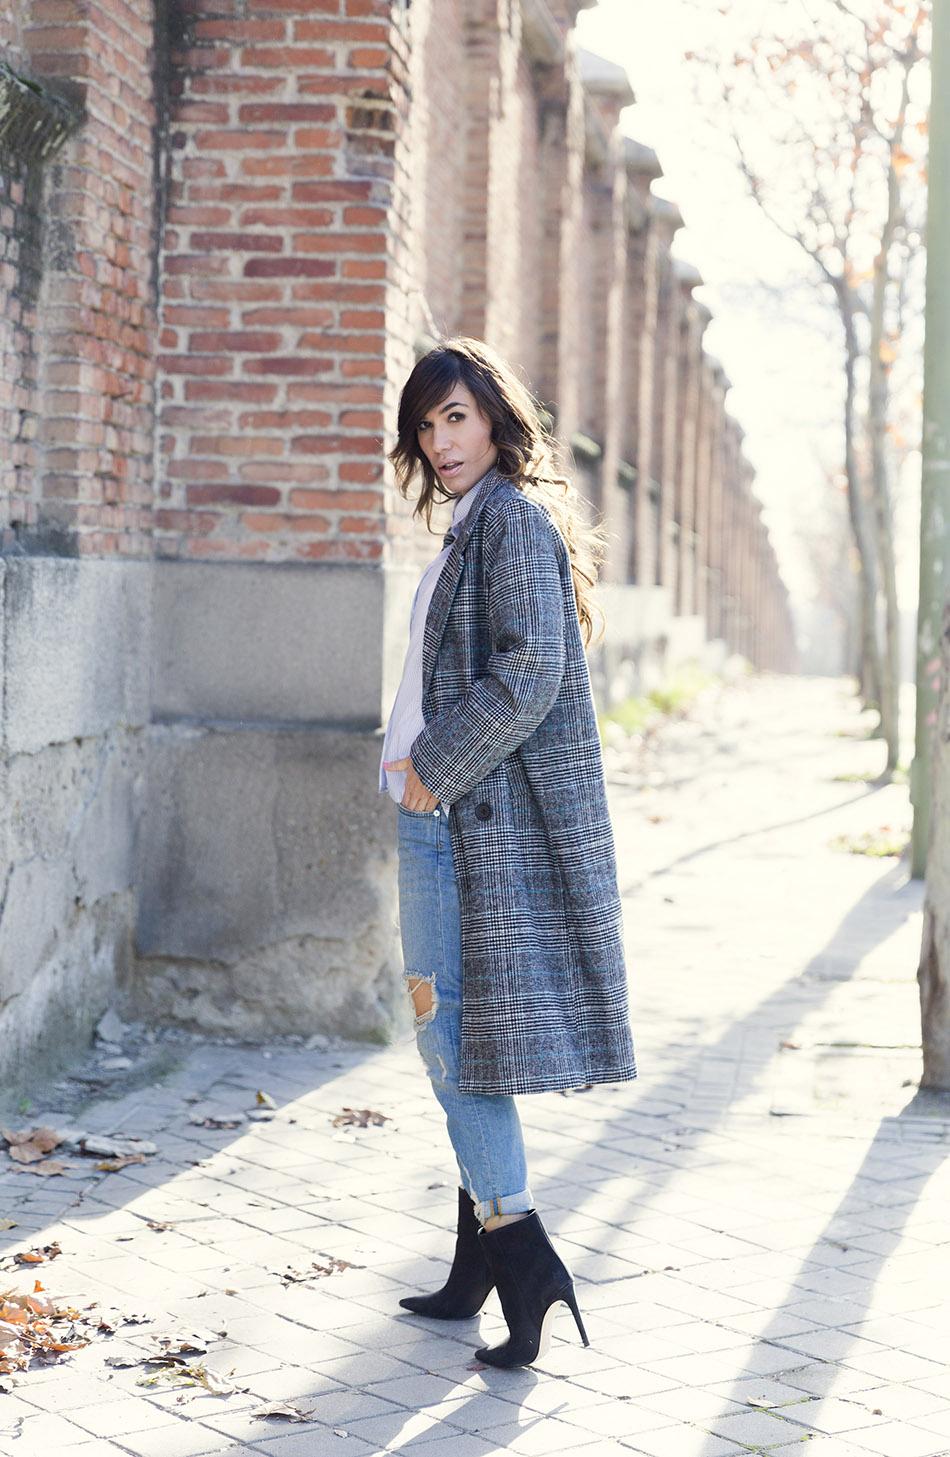 street-style-mango-necklace-hakei-bag-mango-boots-denim-jeans-11